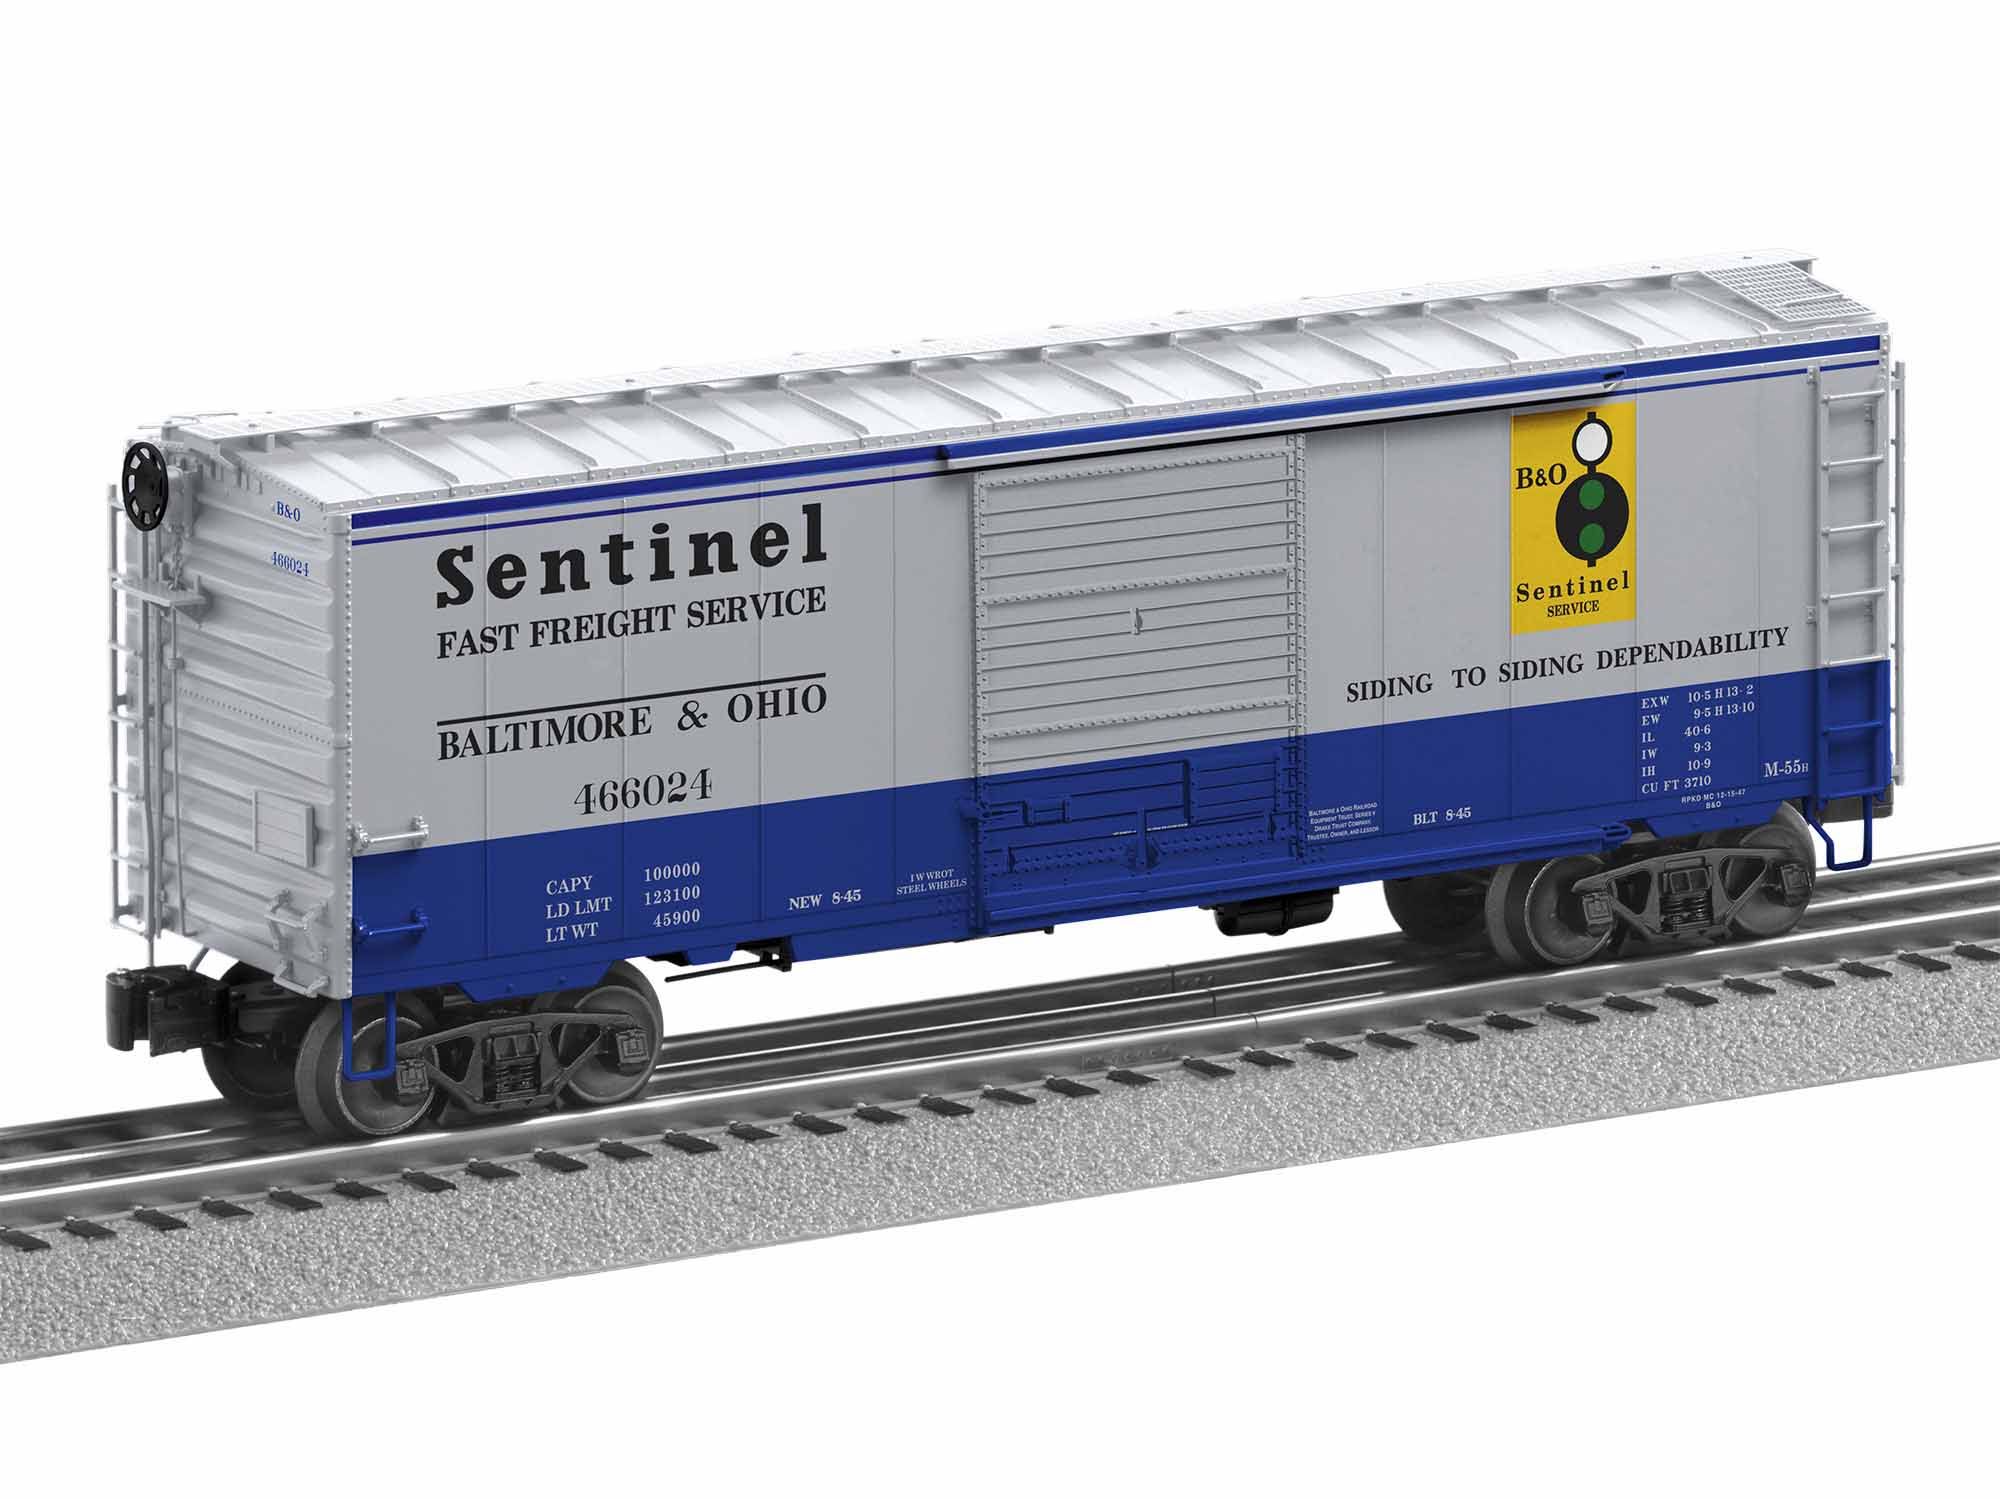 LNL1926620 Lionel O PS-1 Box w/Freight Sound, B&O Sentinel #466024